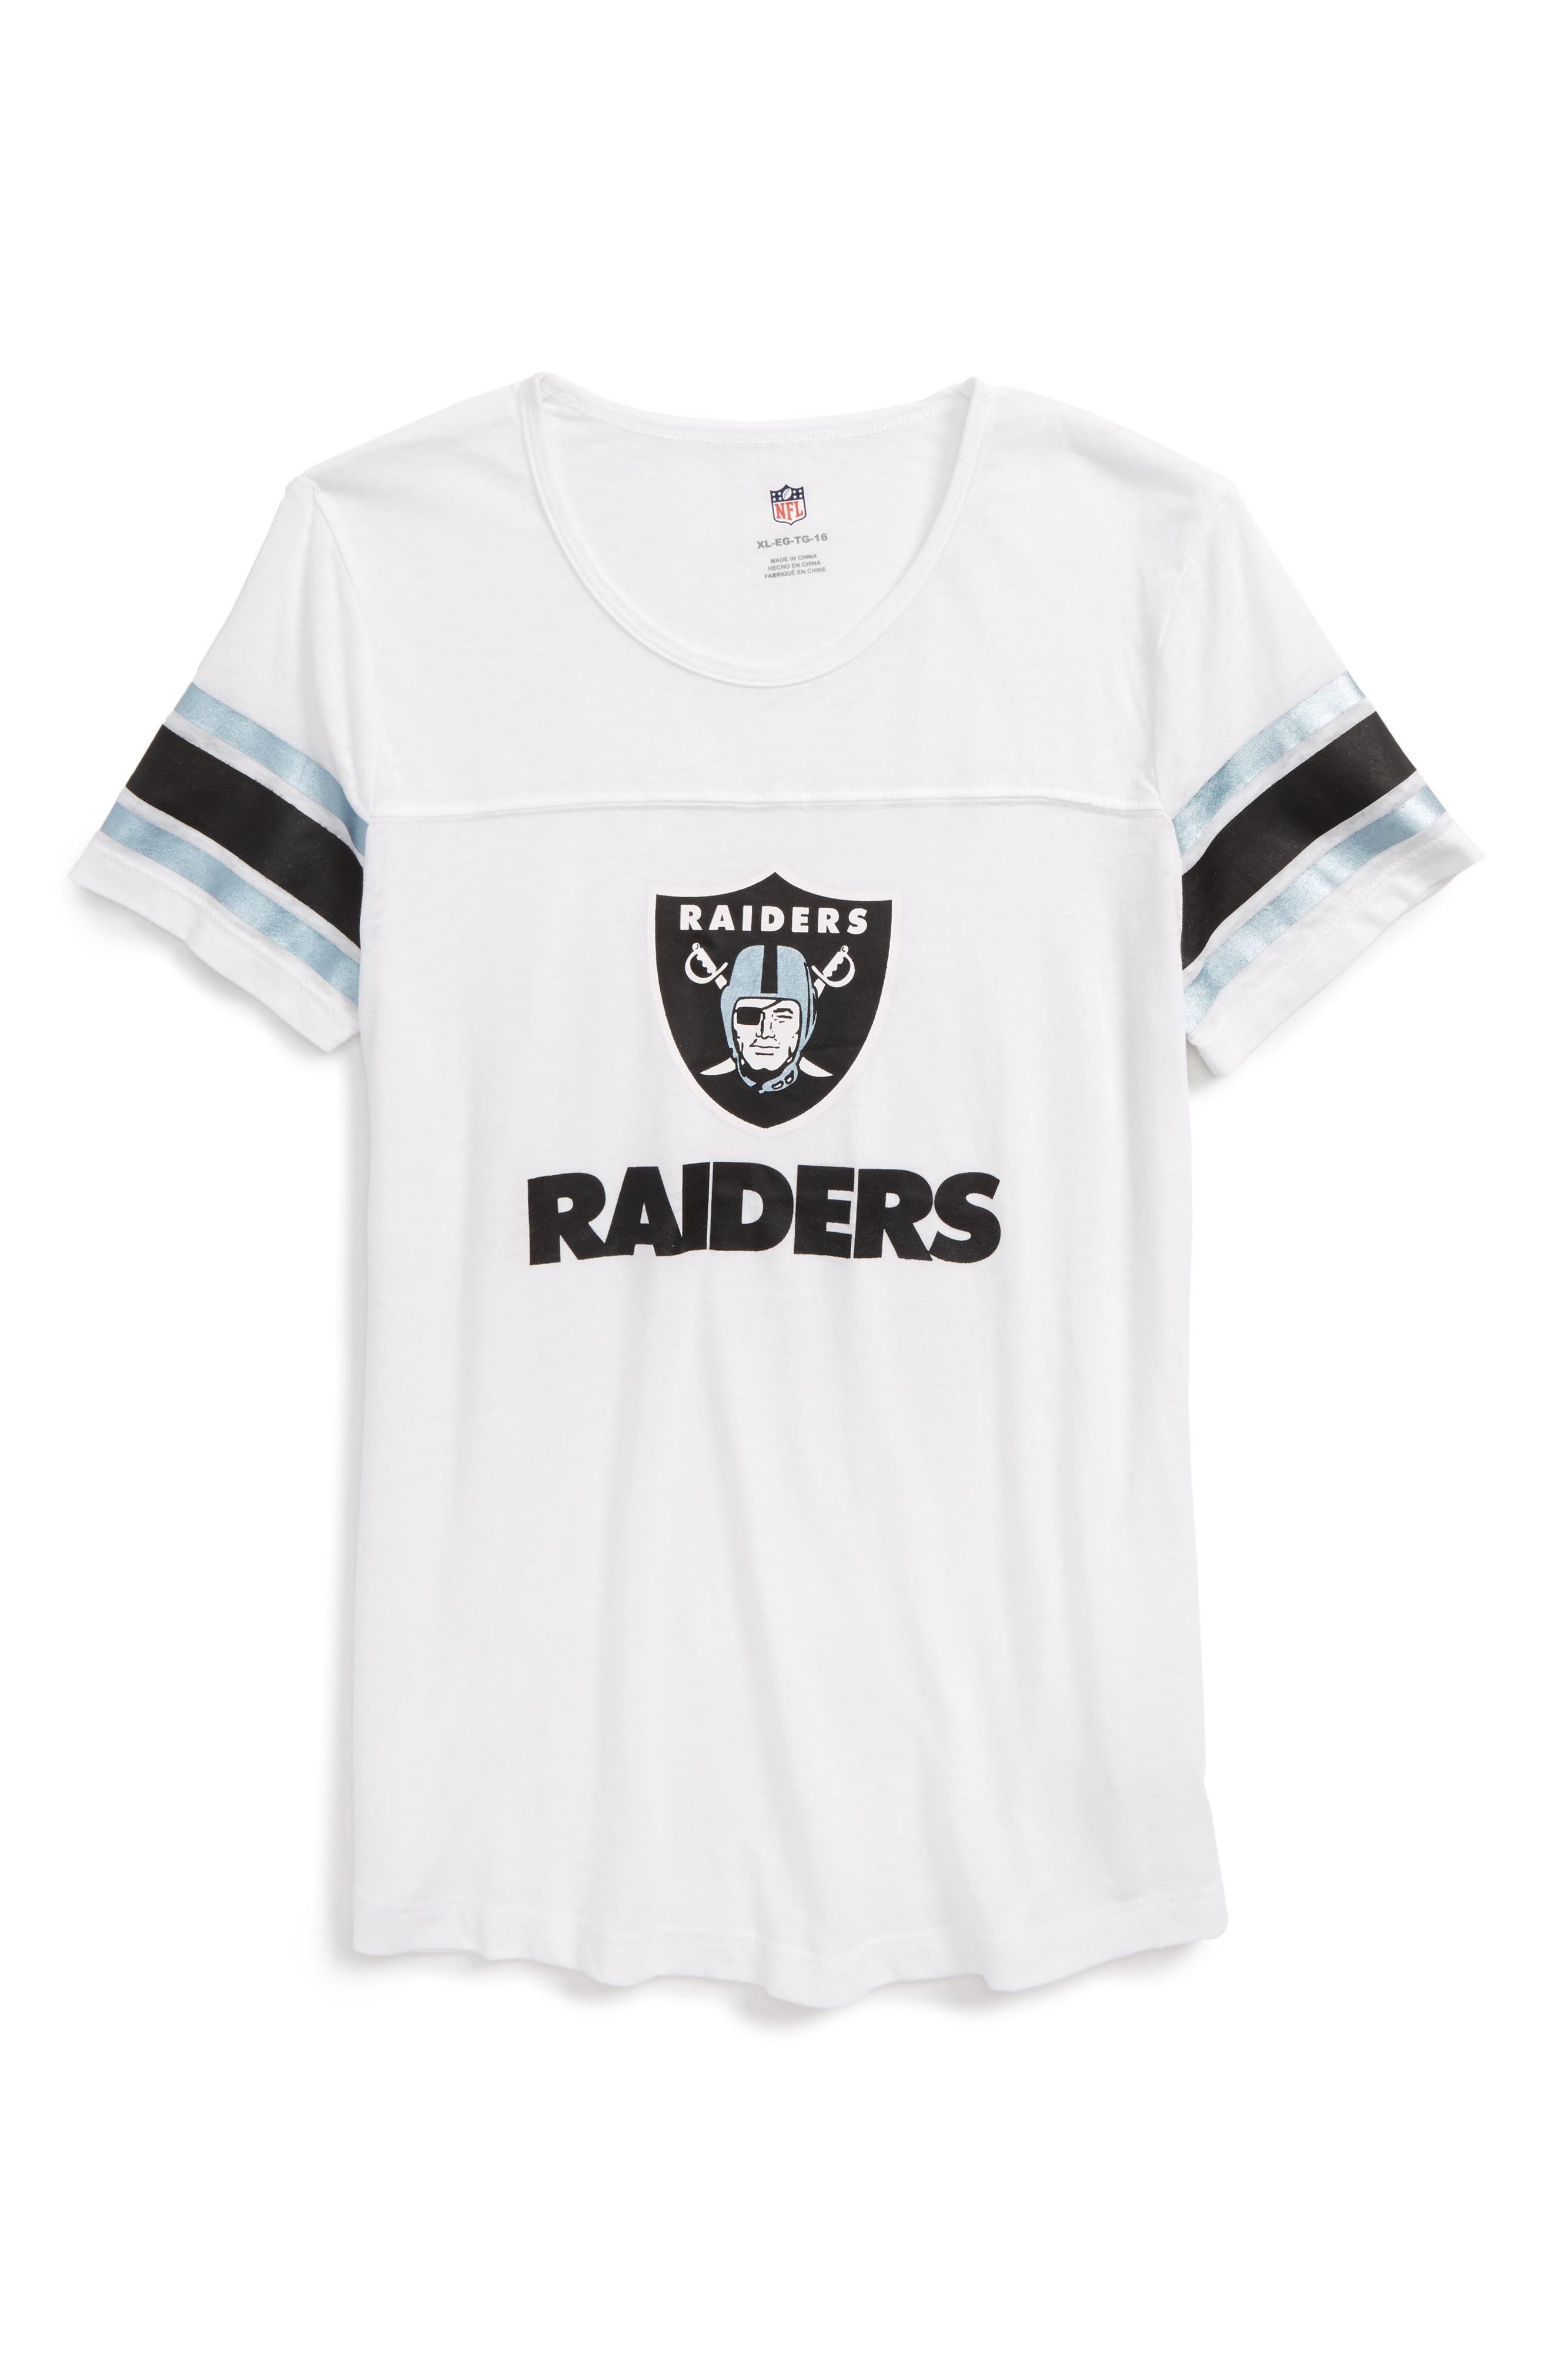 NFL Oakland Raiders Team Pride Tee,                             Main thumbnail 1, color,                             006